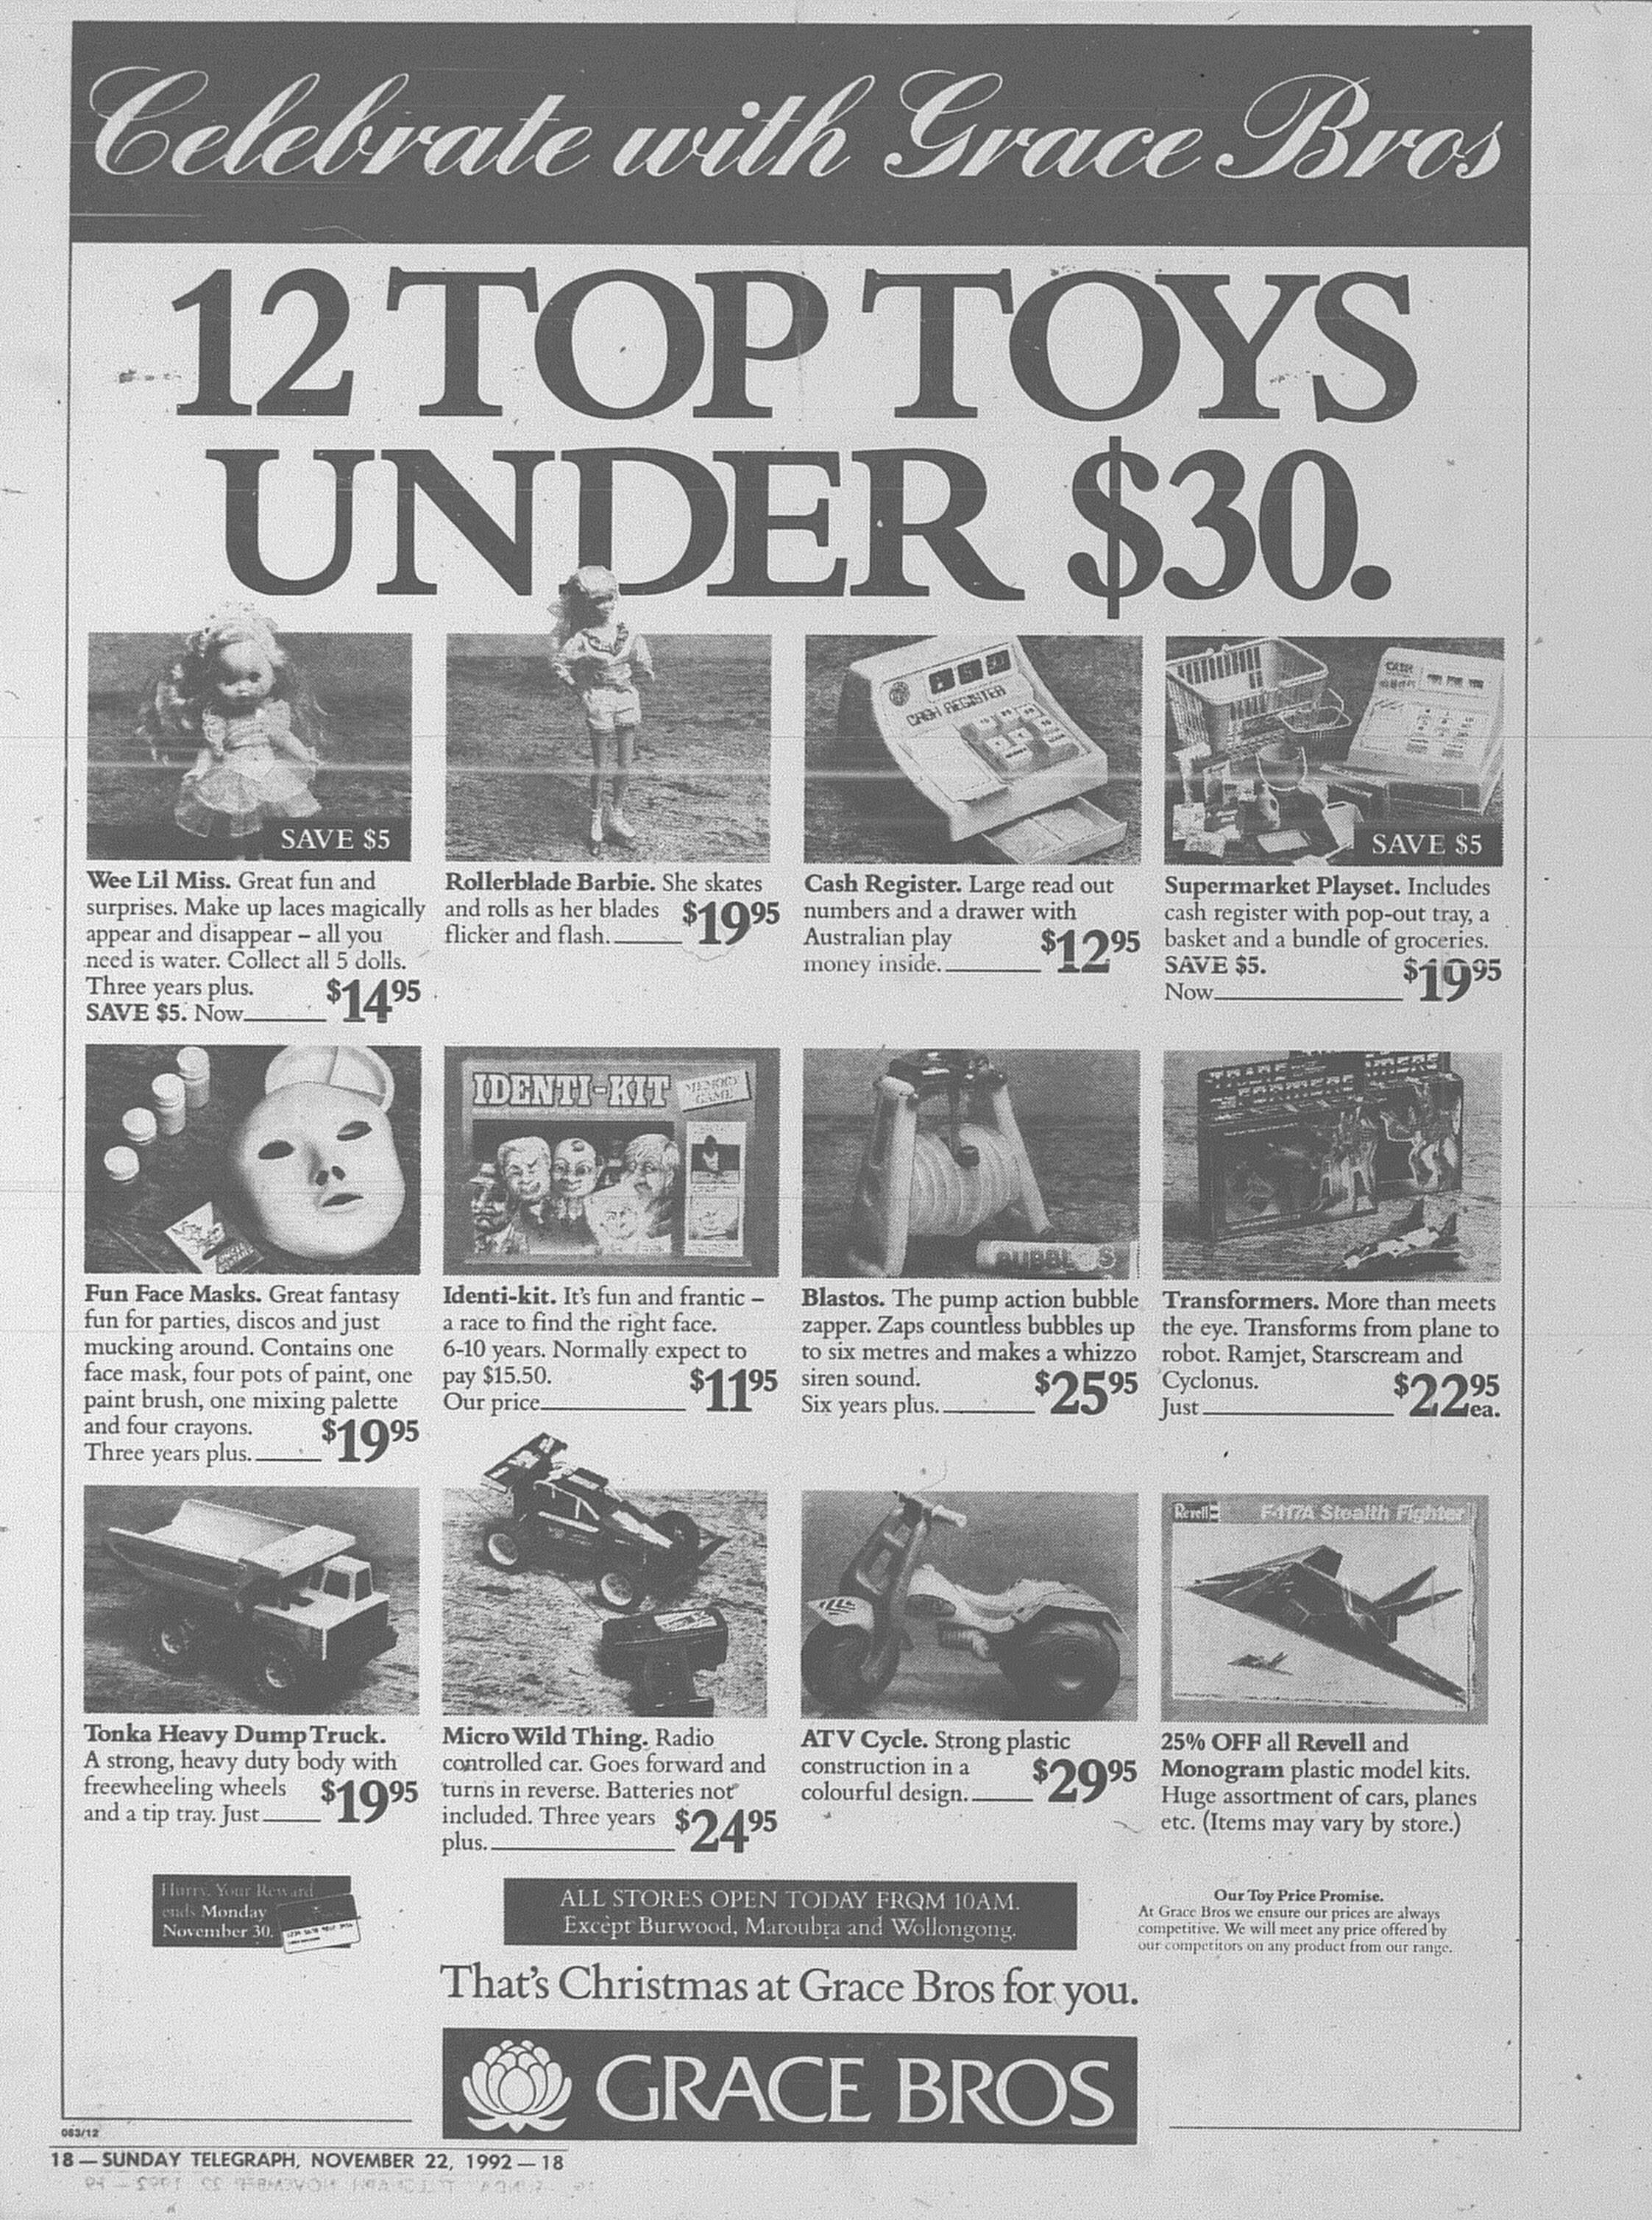 Grace Bros Ad November 22 1992 sunday telegraph 18